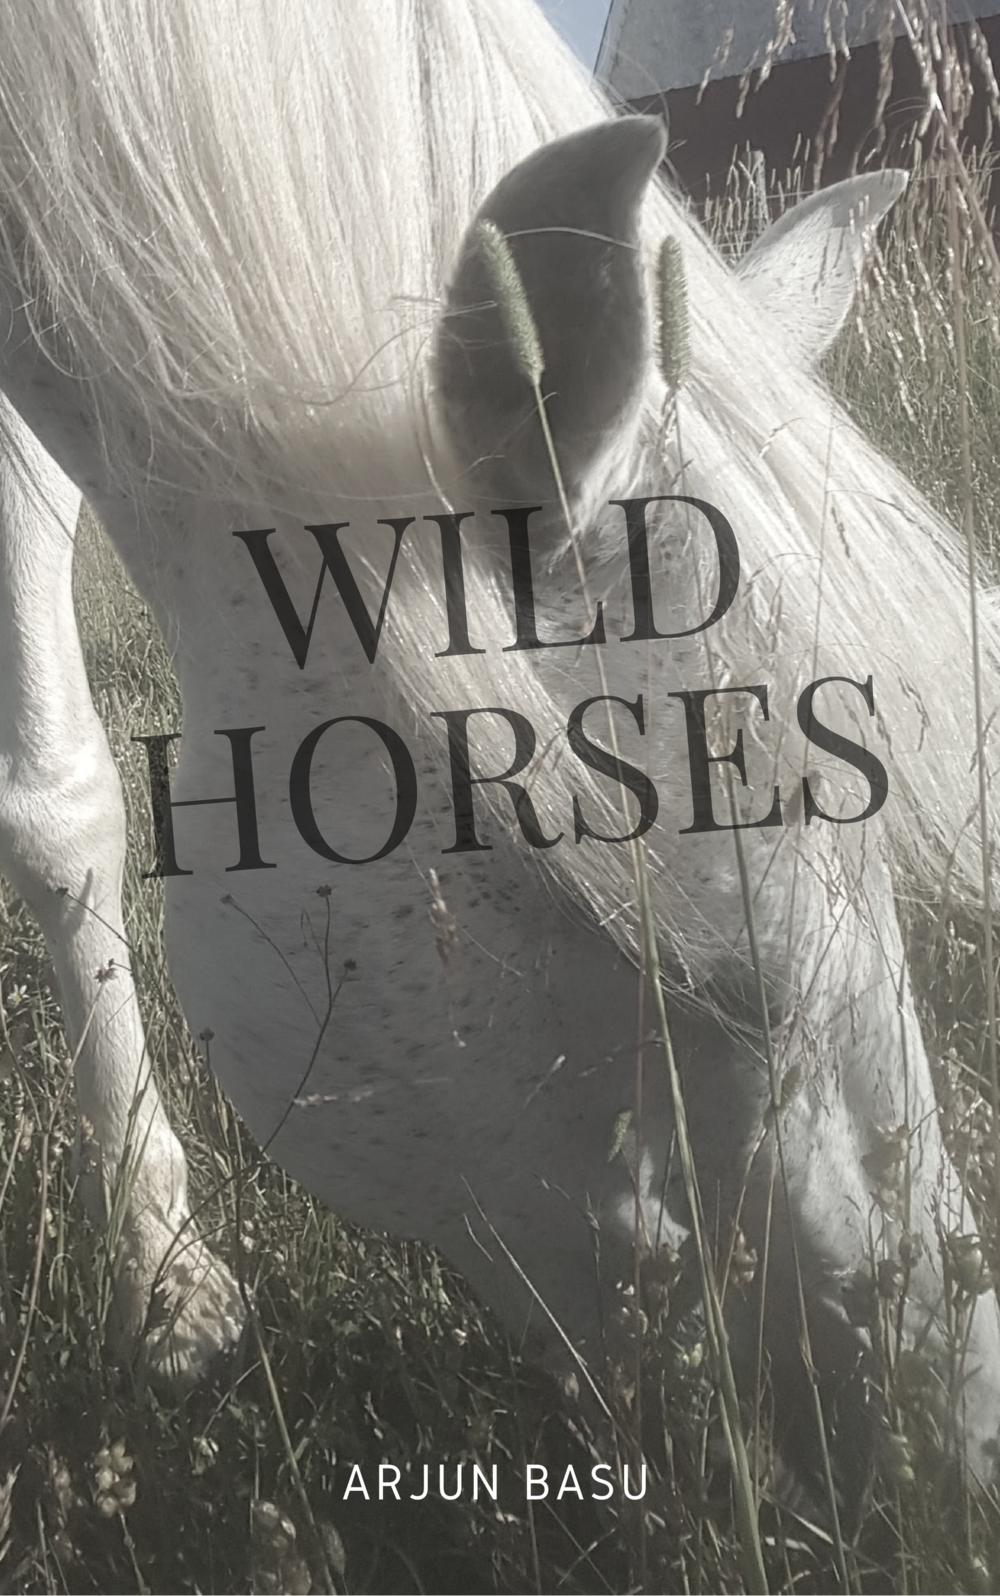 Wild Horses by Arjun Basu